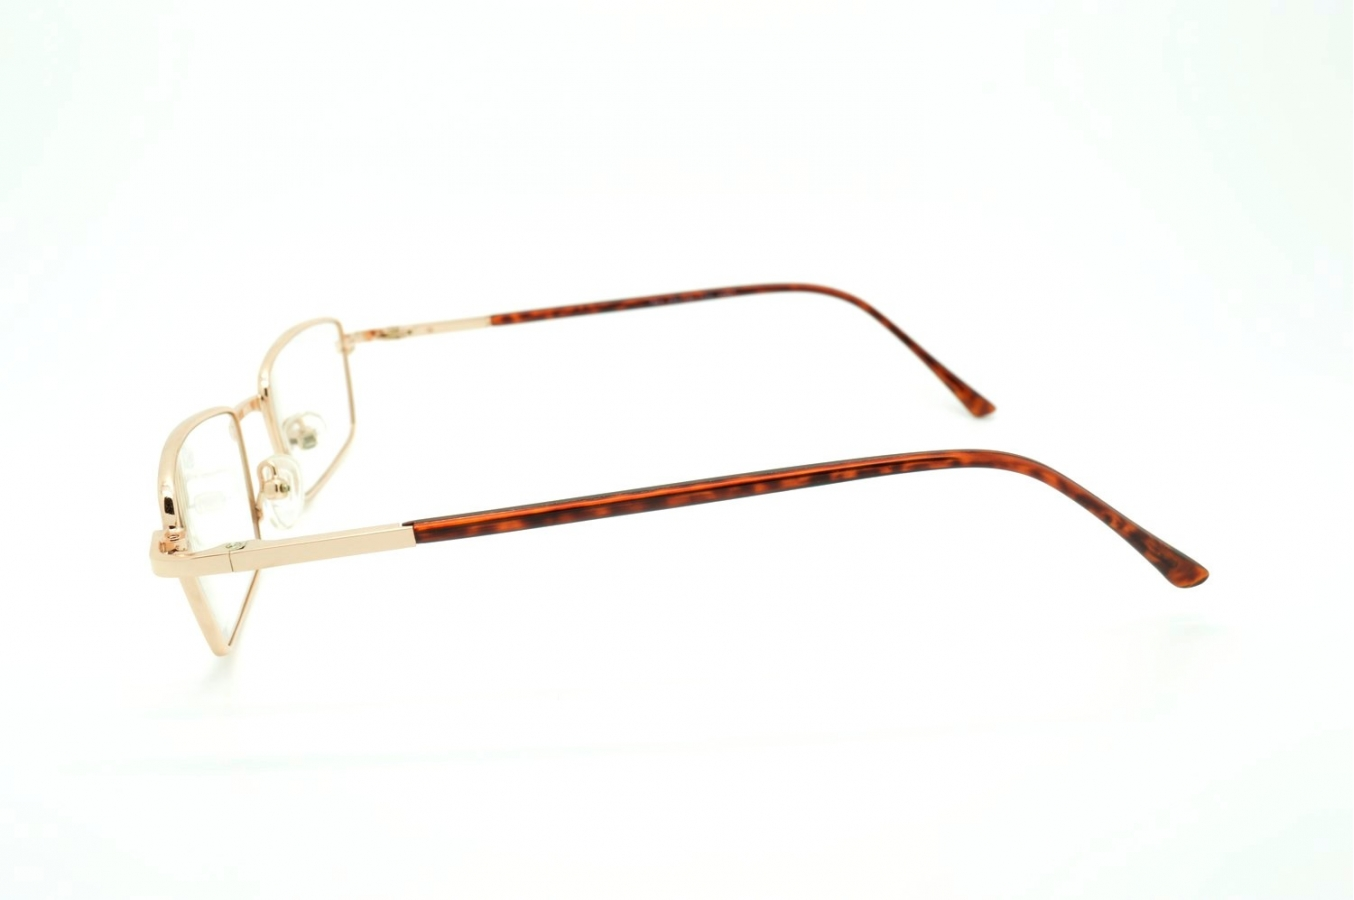 rectangular metal reading glasses with plastic temples k